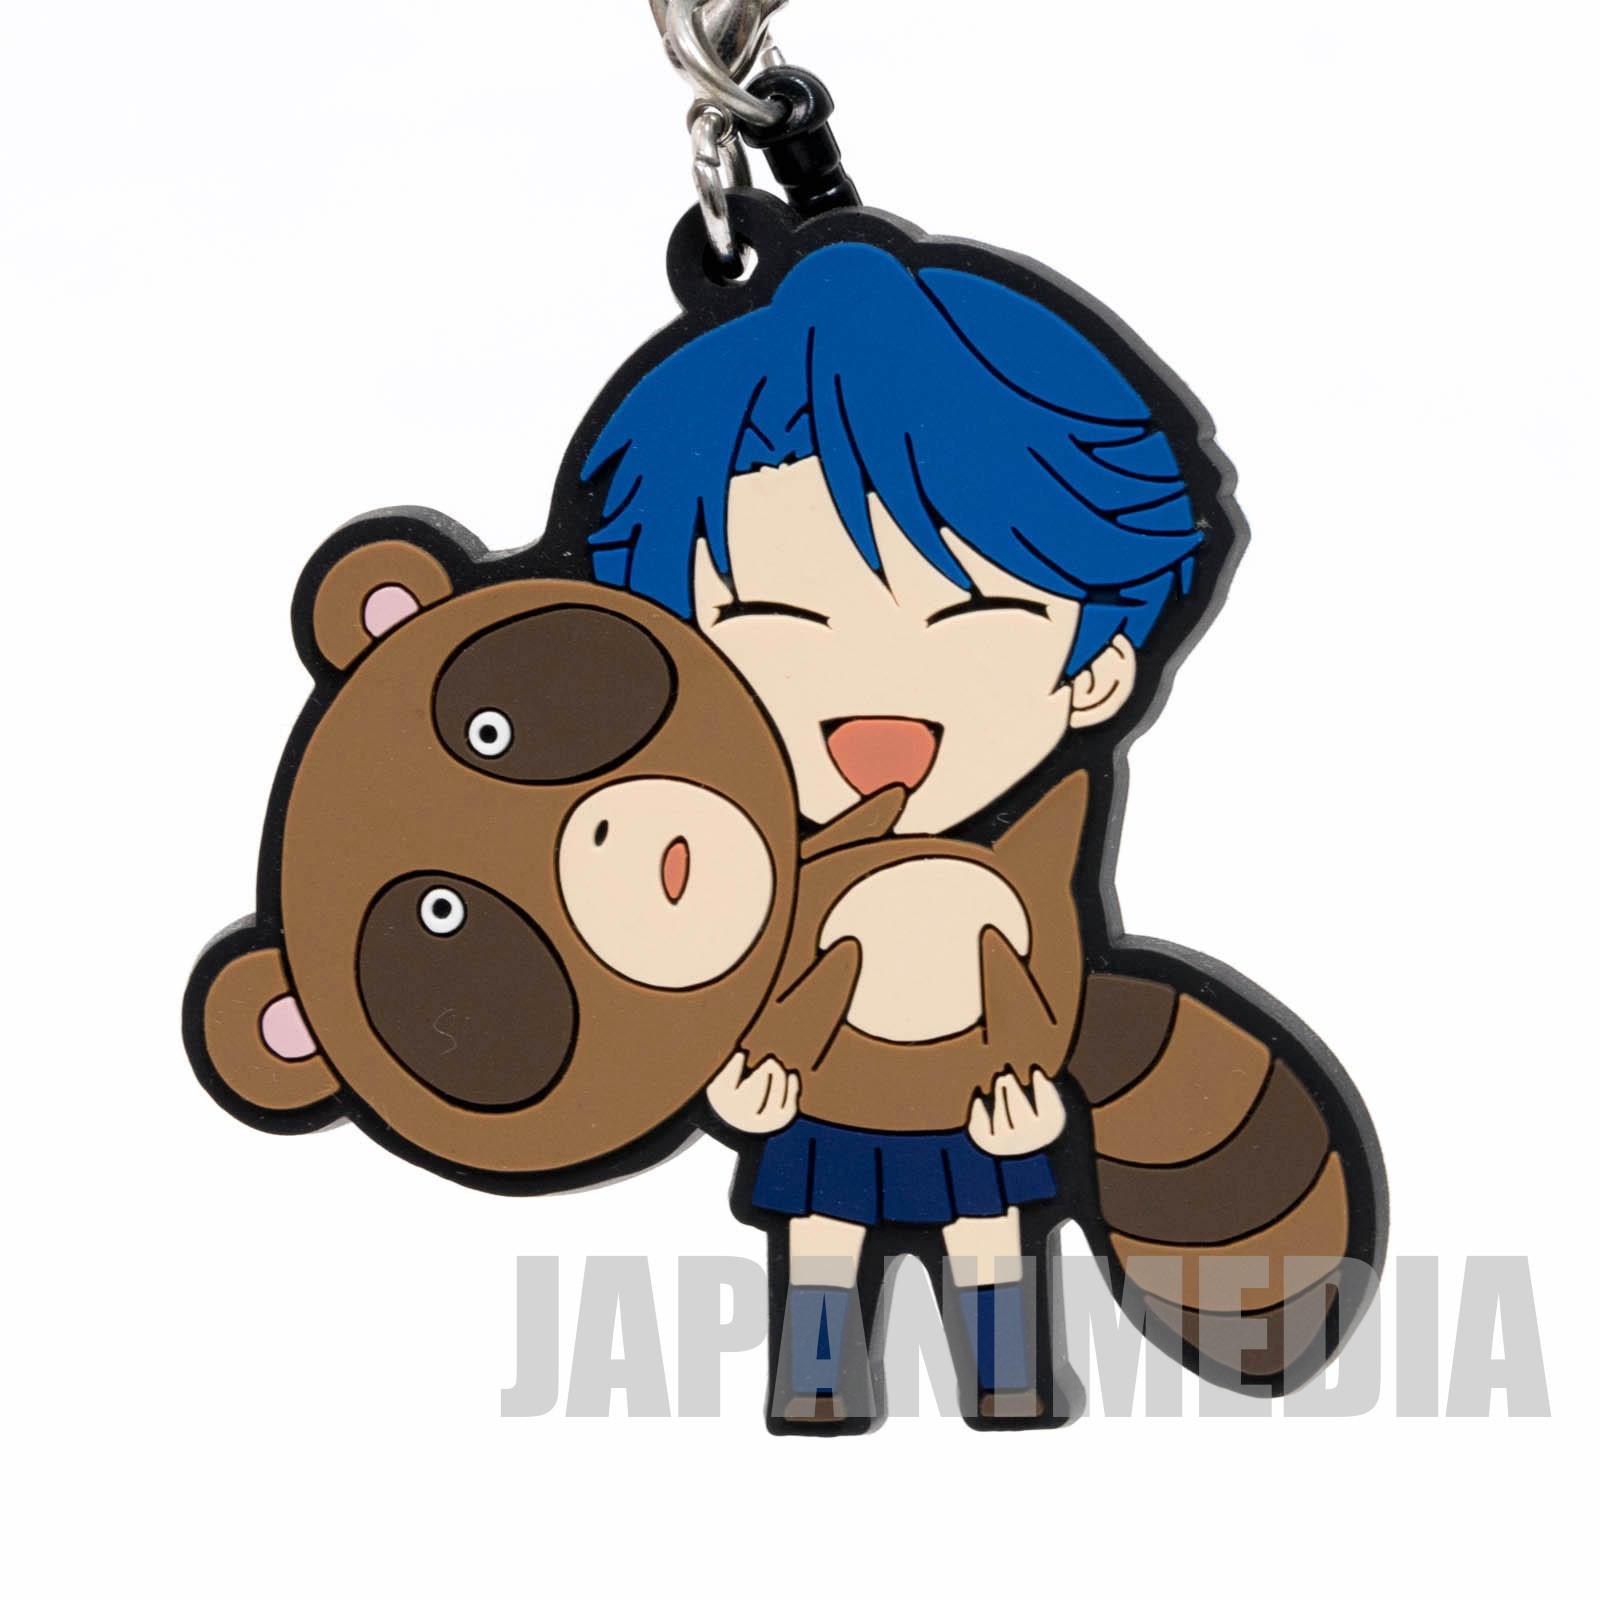 Monthly Girls' Nozaki-Kun Yuu Kashima Raccoon Trading Rubber Strap JAPAN ANIME MANGA